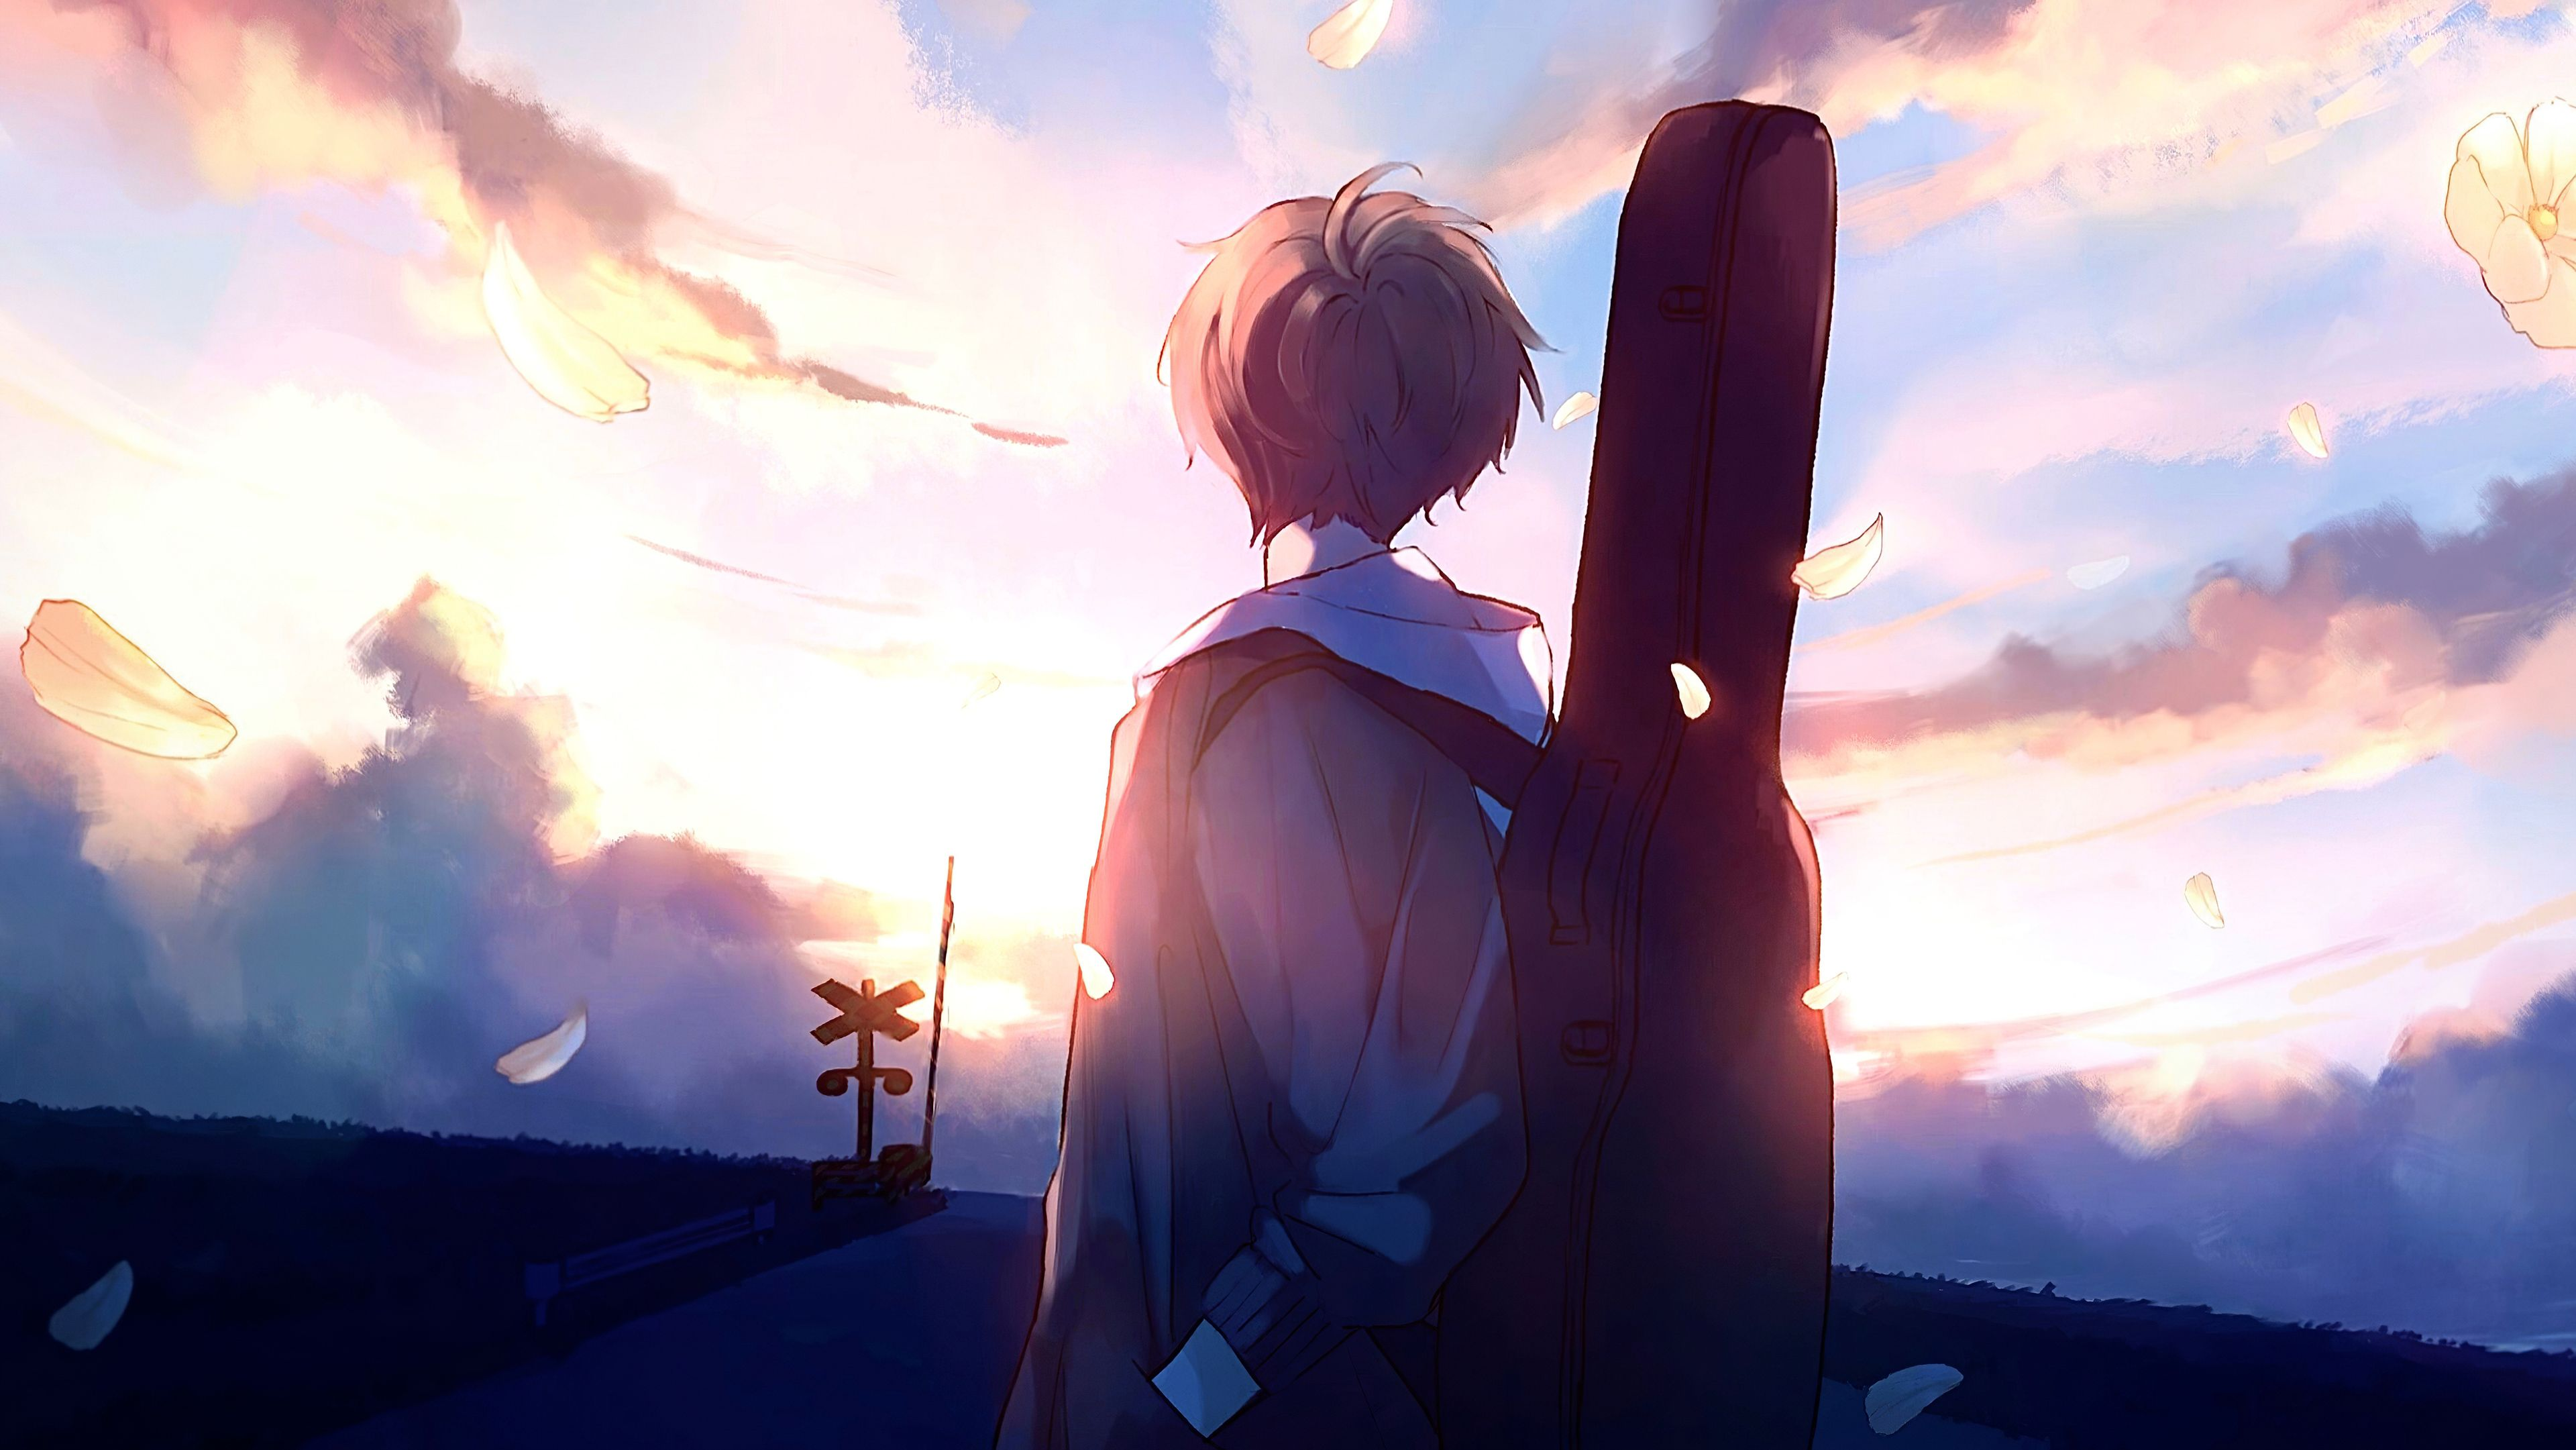 Anime Boy Guitar Painting Anime Animation Background Anime Boy